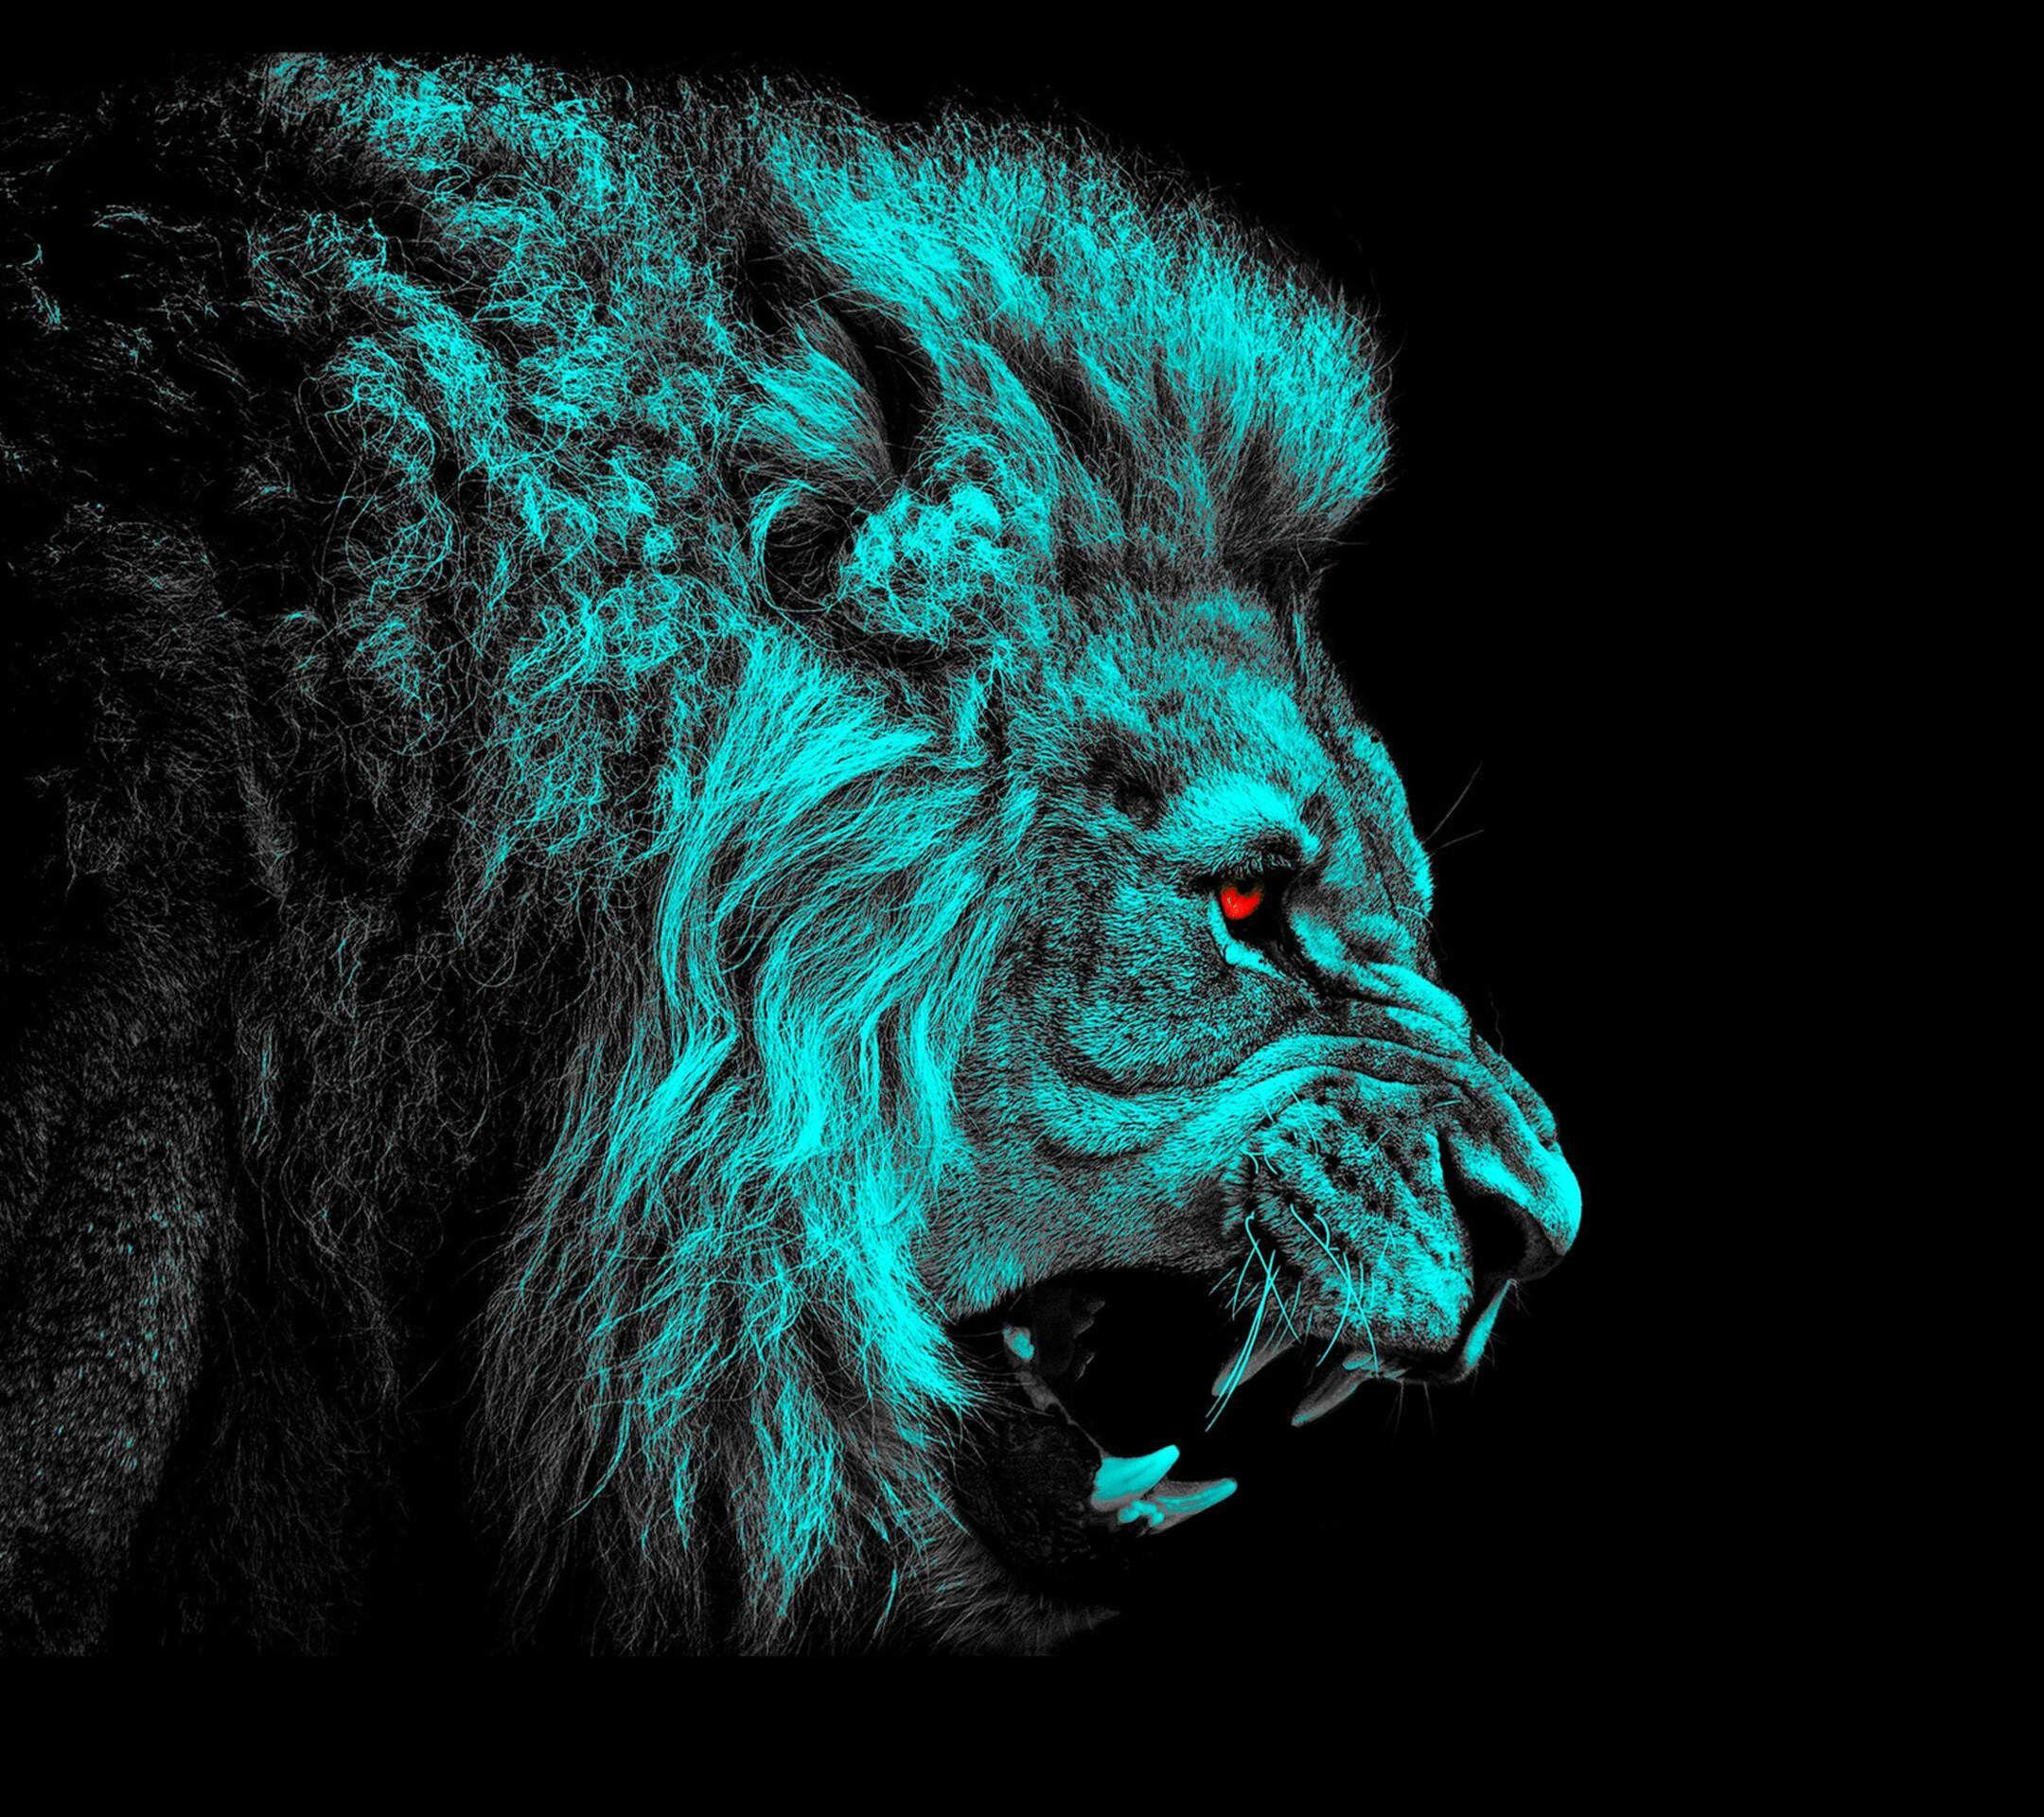 2160x1920 HD Wallpaper Background ID451271 Lion